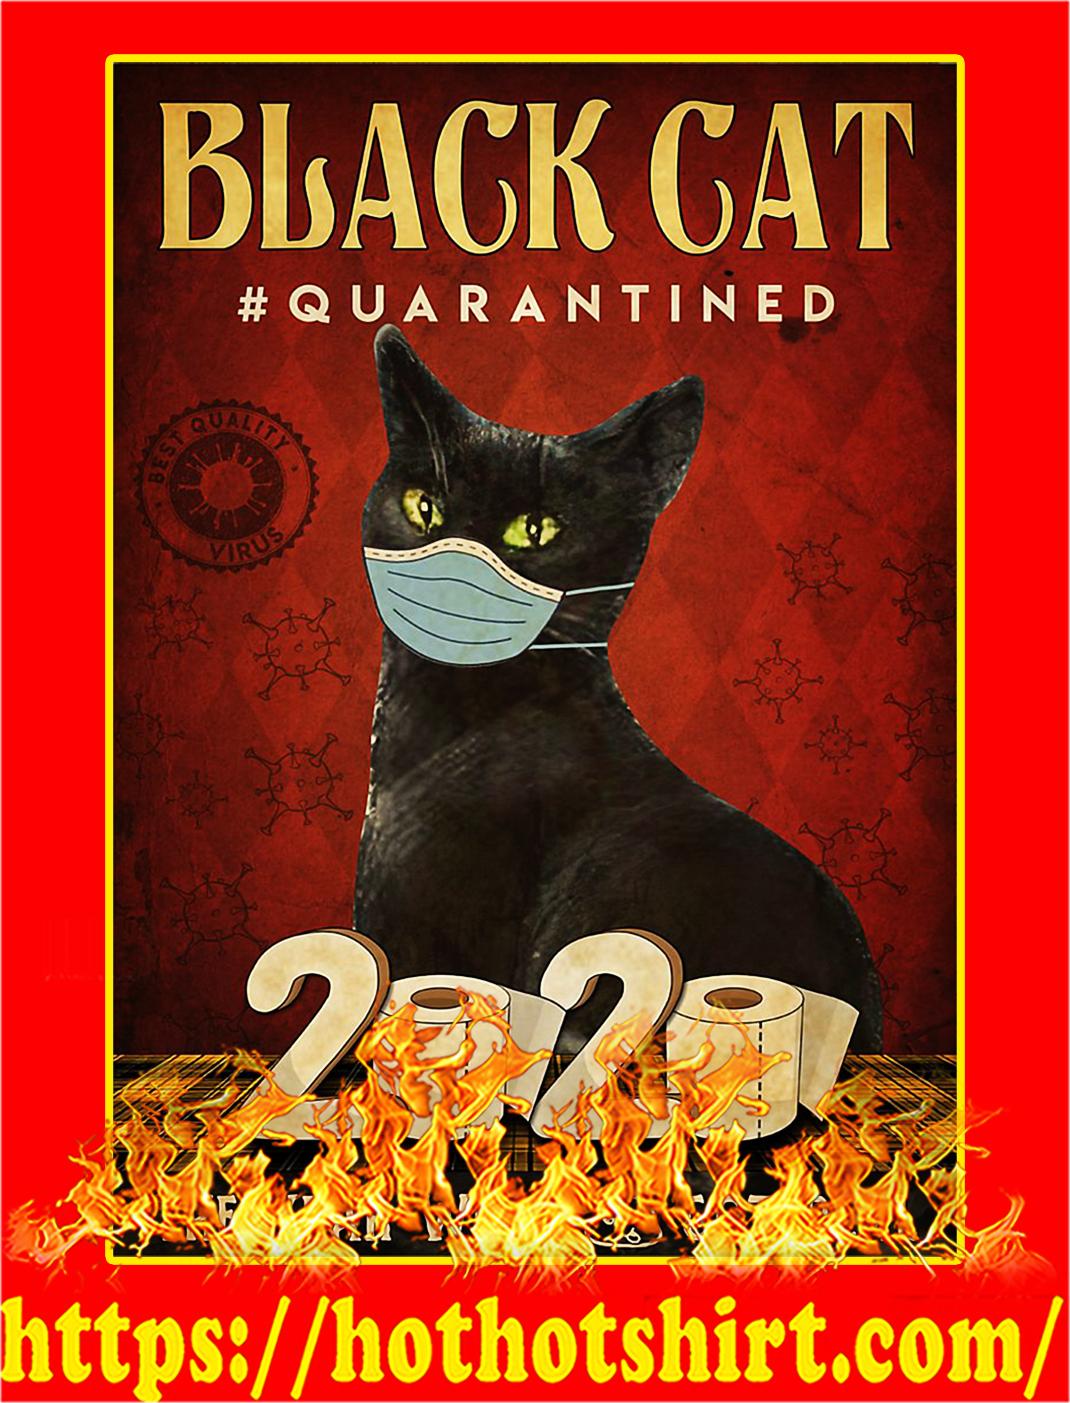 Black cat quarantined 2020 poster - A2